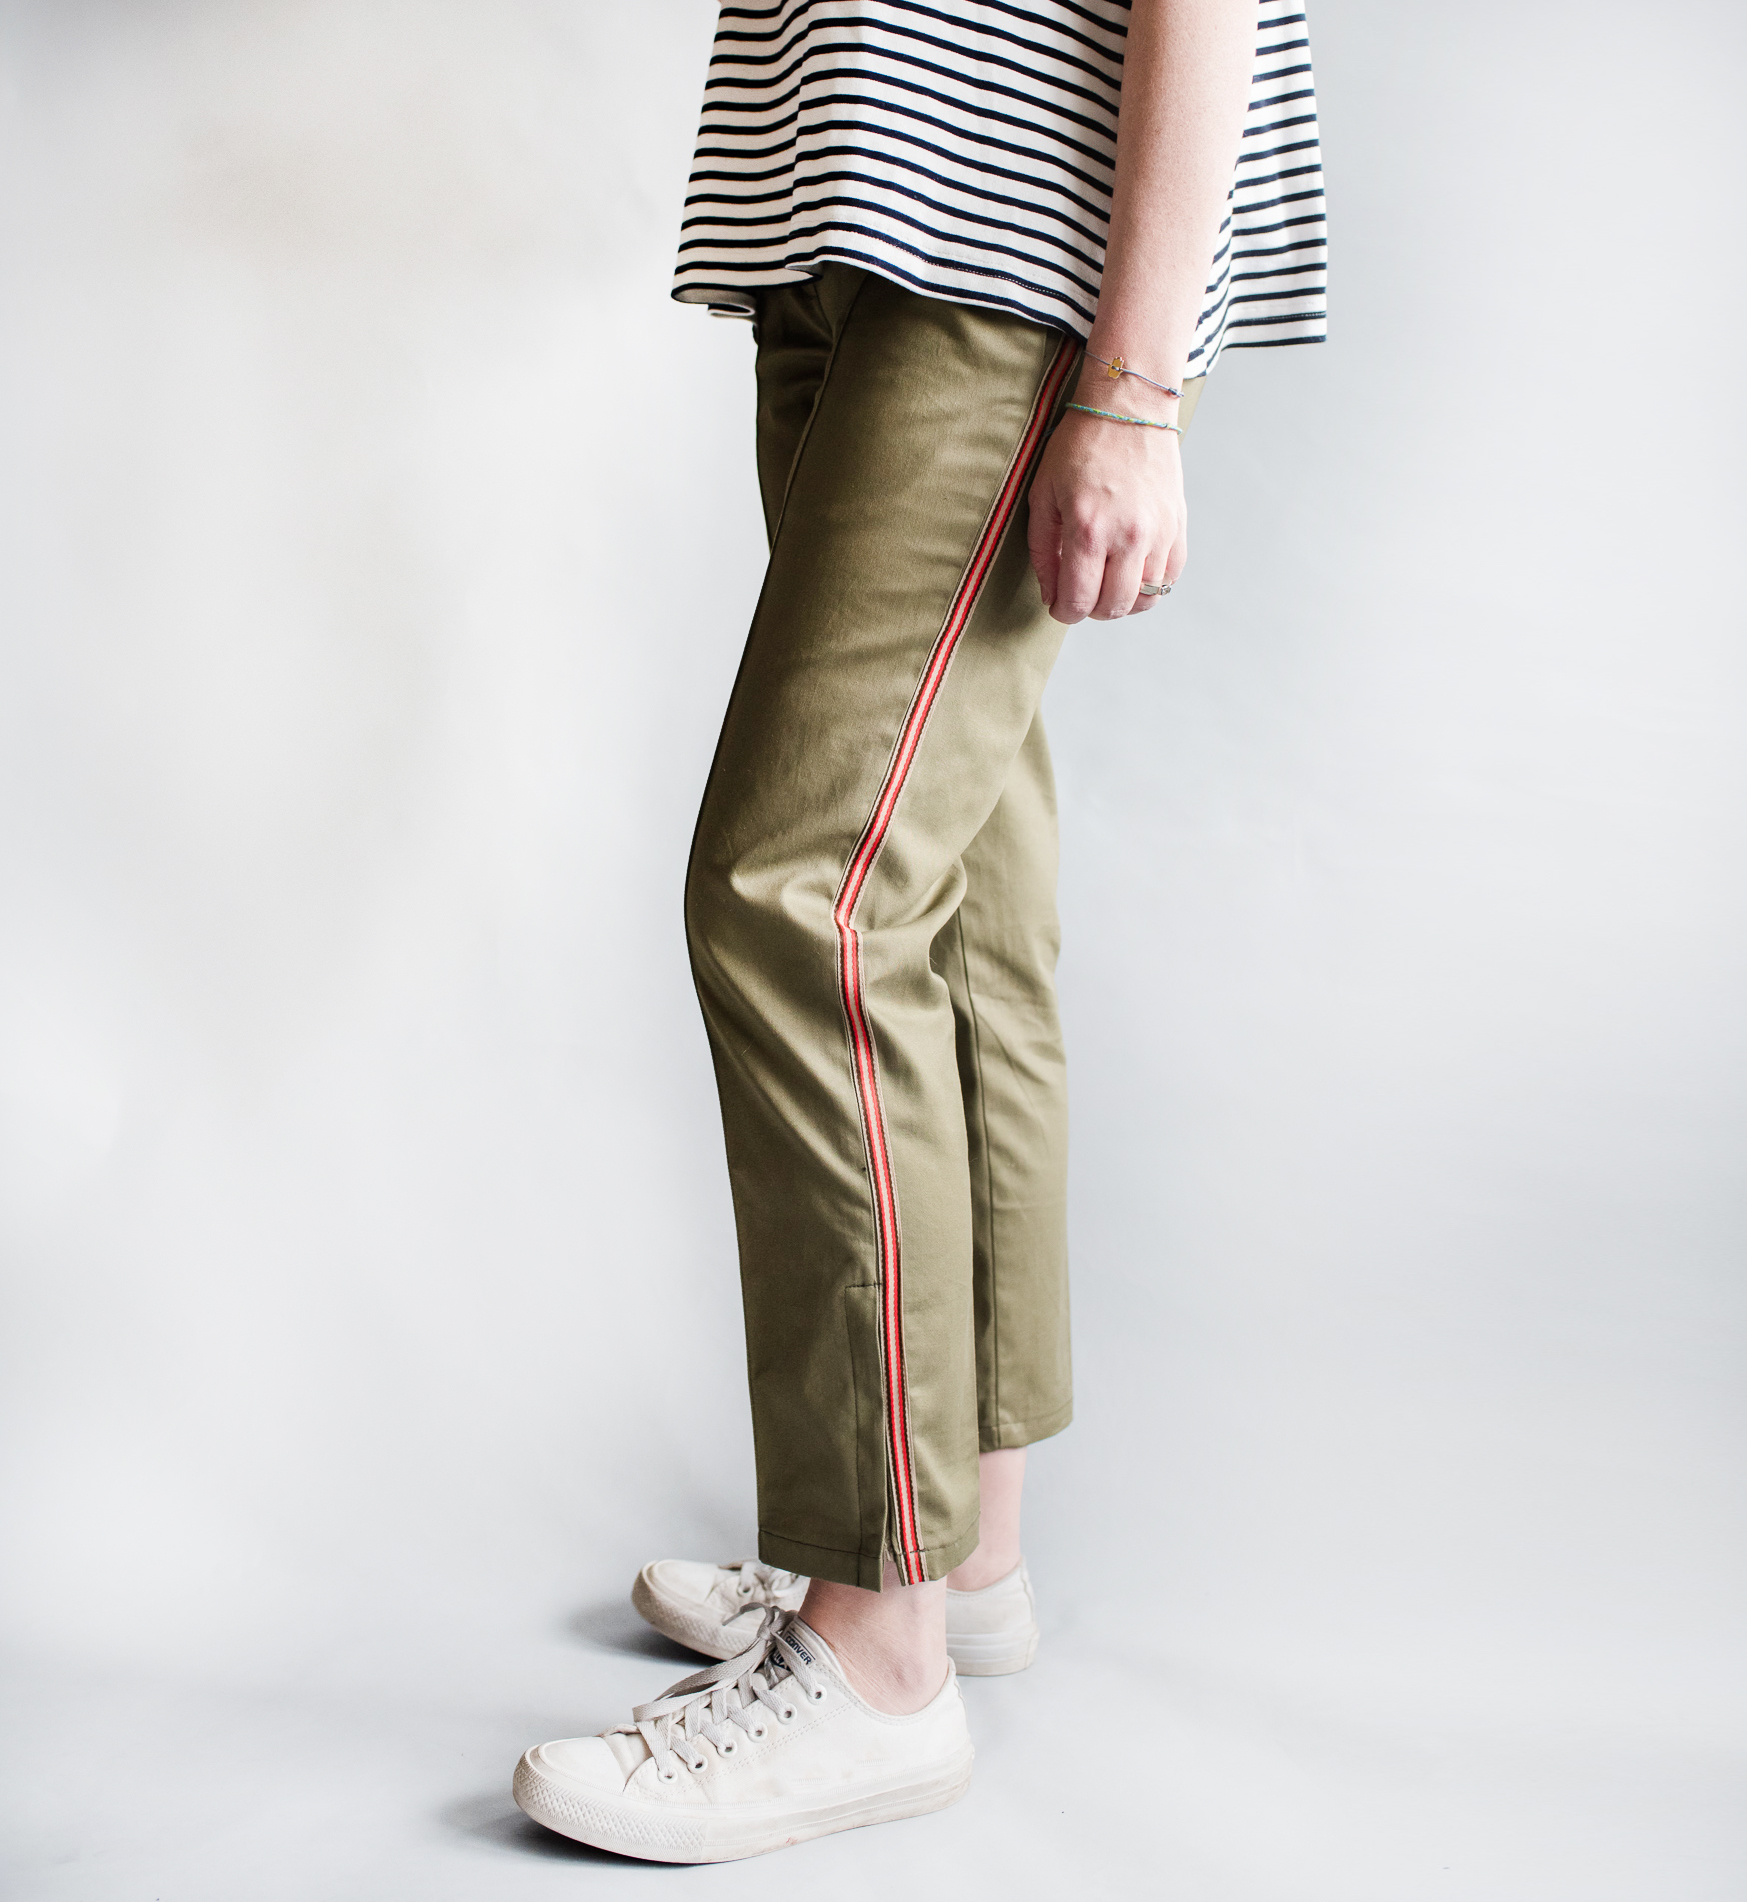 robinson-pdf-sewing-trouser28.jpg